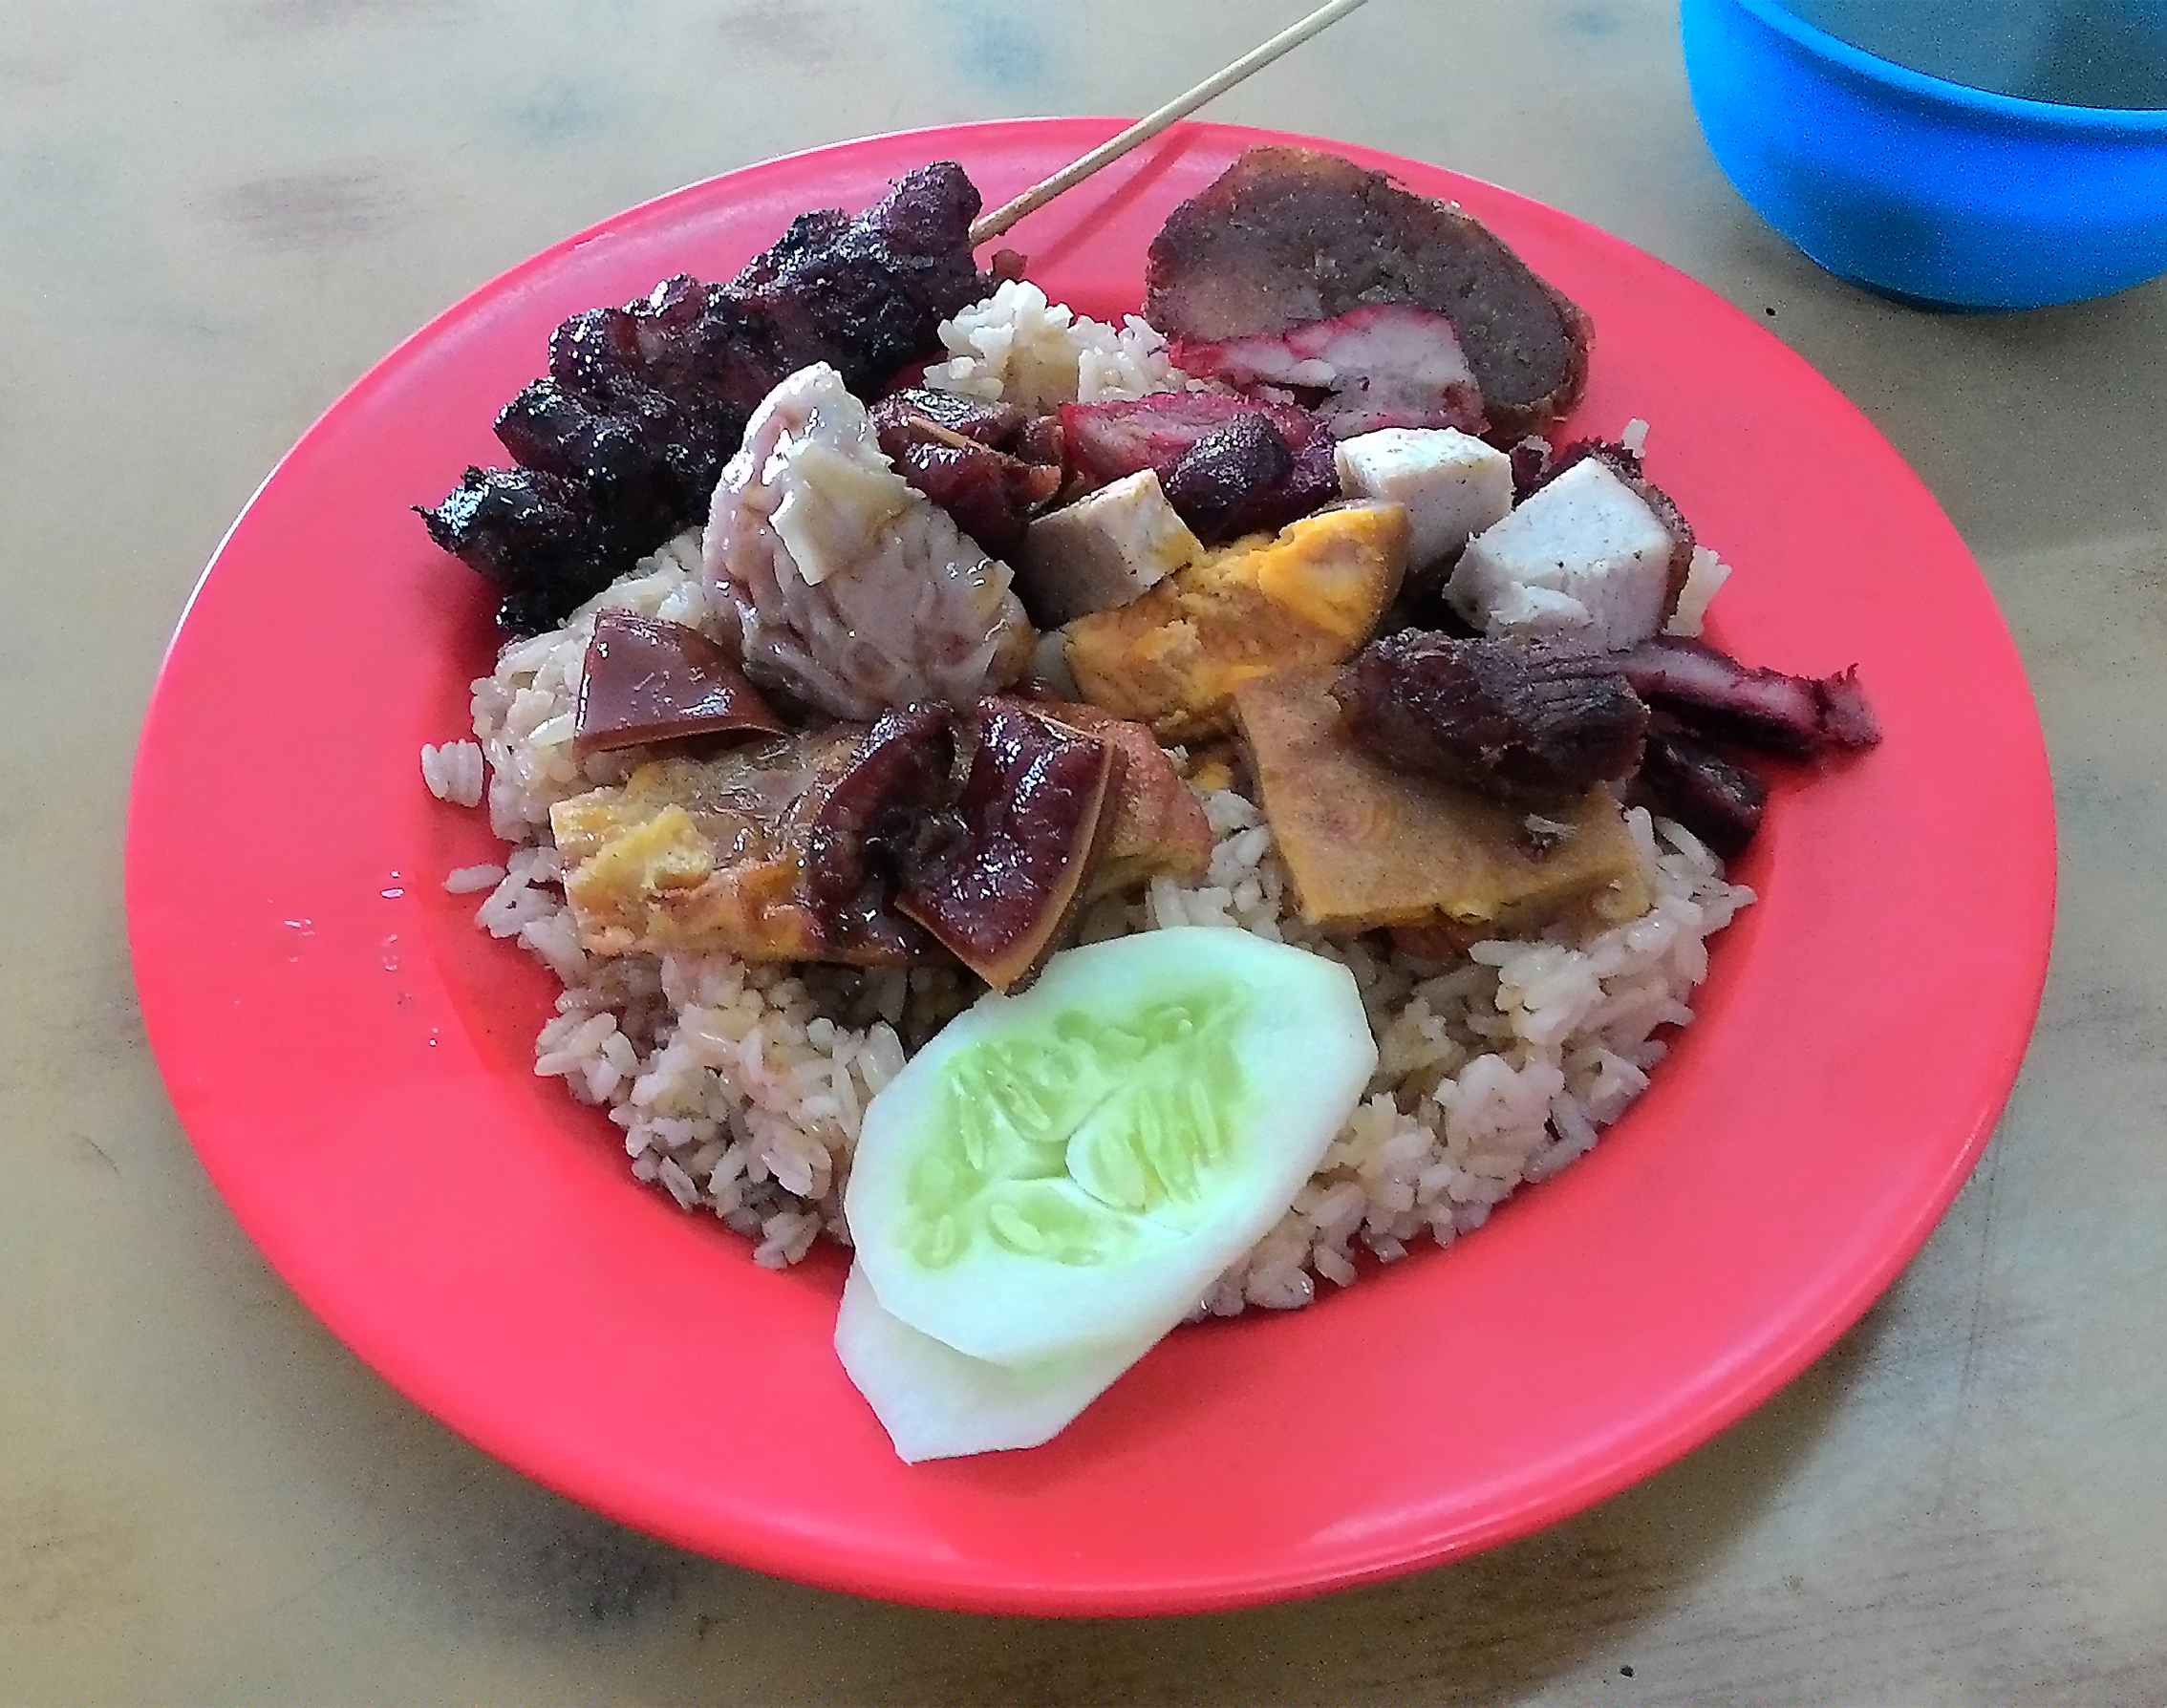 Berkasnasi Campur Tionghoa Kenanga 2 Wikipedia Bahasa Samcan Babi Special Pork Belly